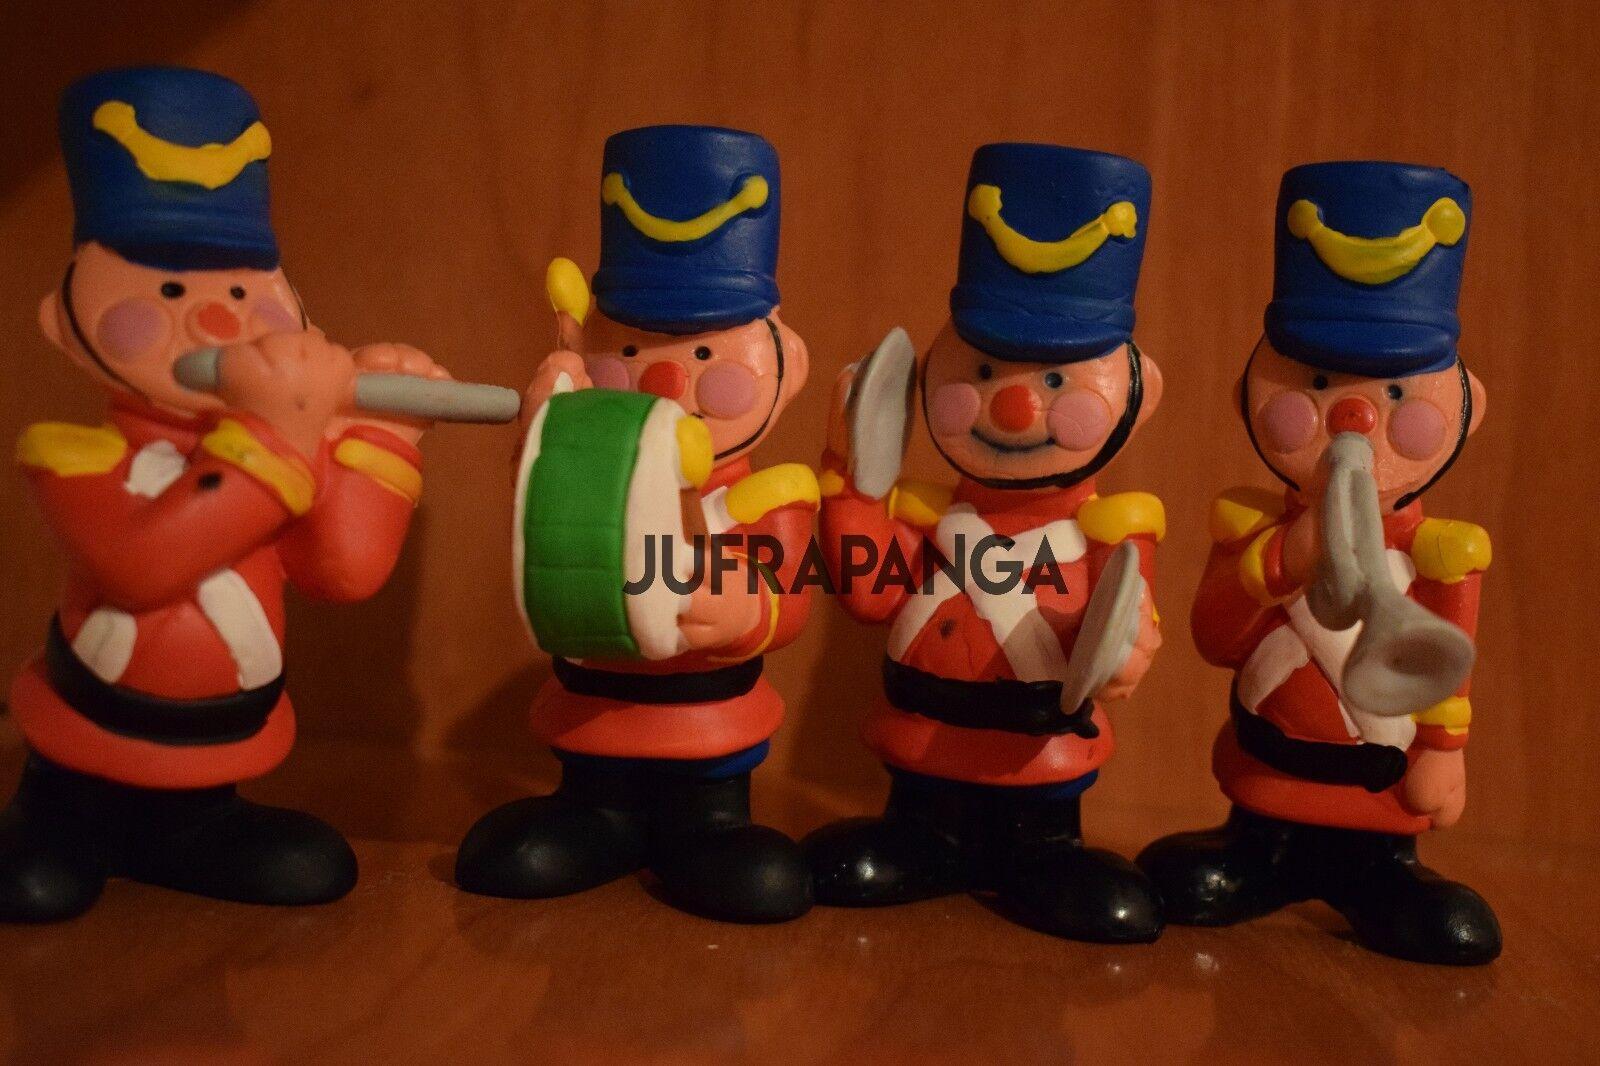 STARTOYS star toys FIGURAS PVC GOMA MUSICOS UNIFORMADOS VINTAGE′80 SOLDADITO